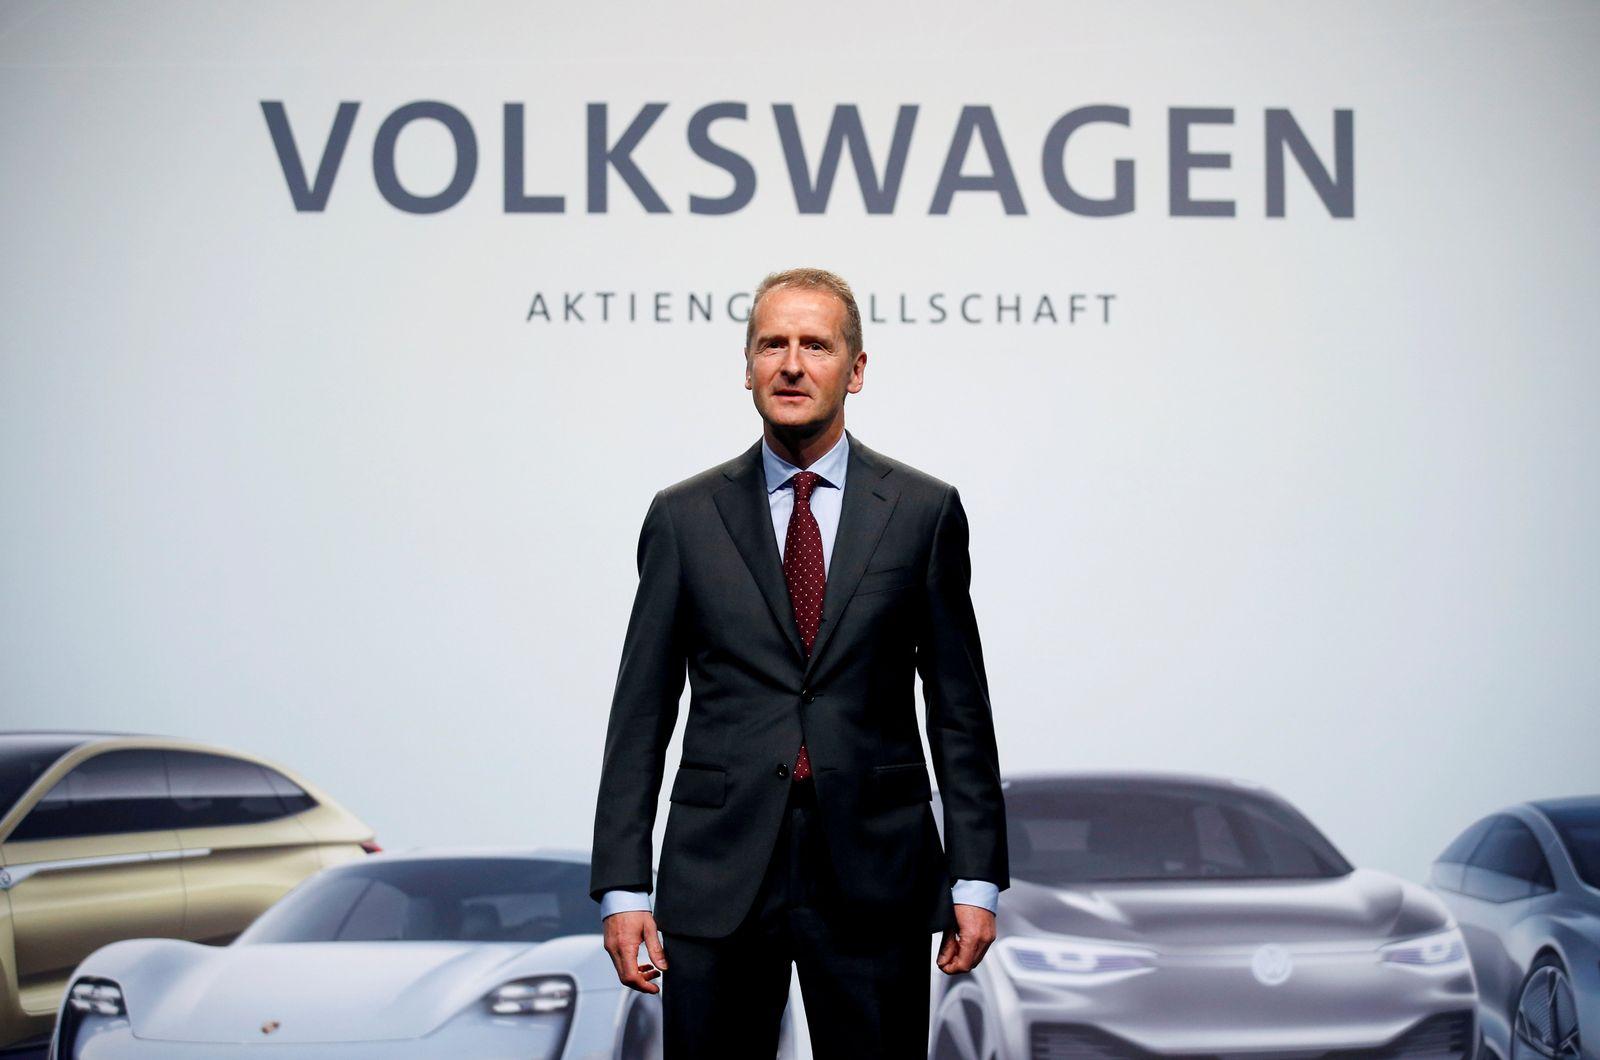 EU-AUTOS/EMISSIONS-VOLKSWAGEN